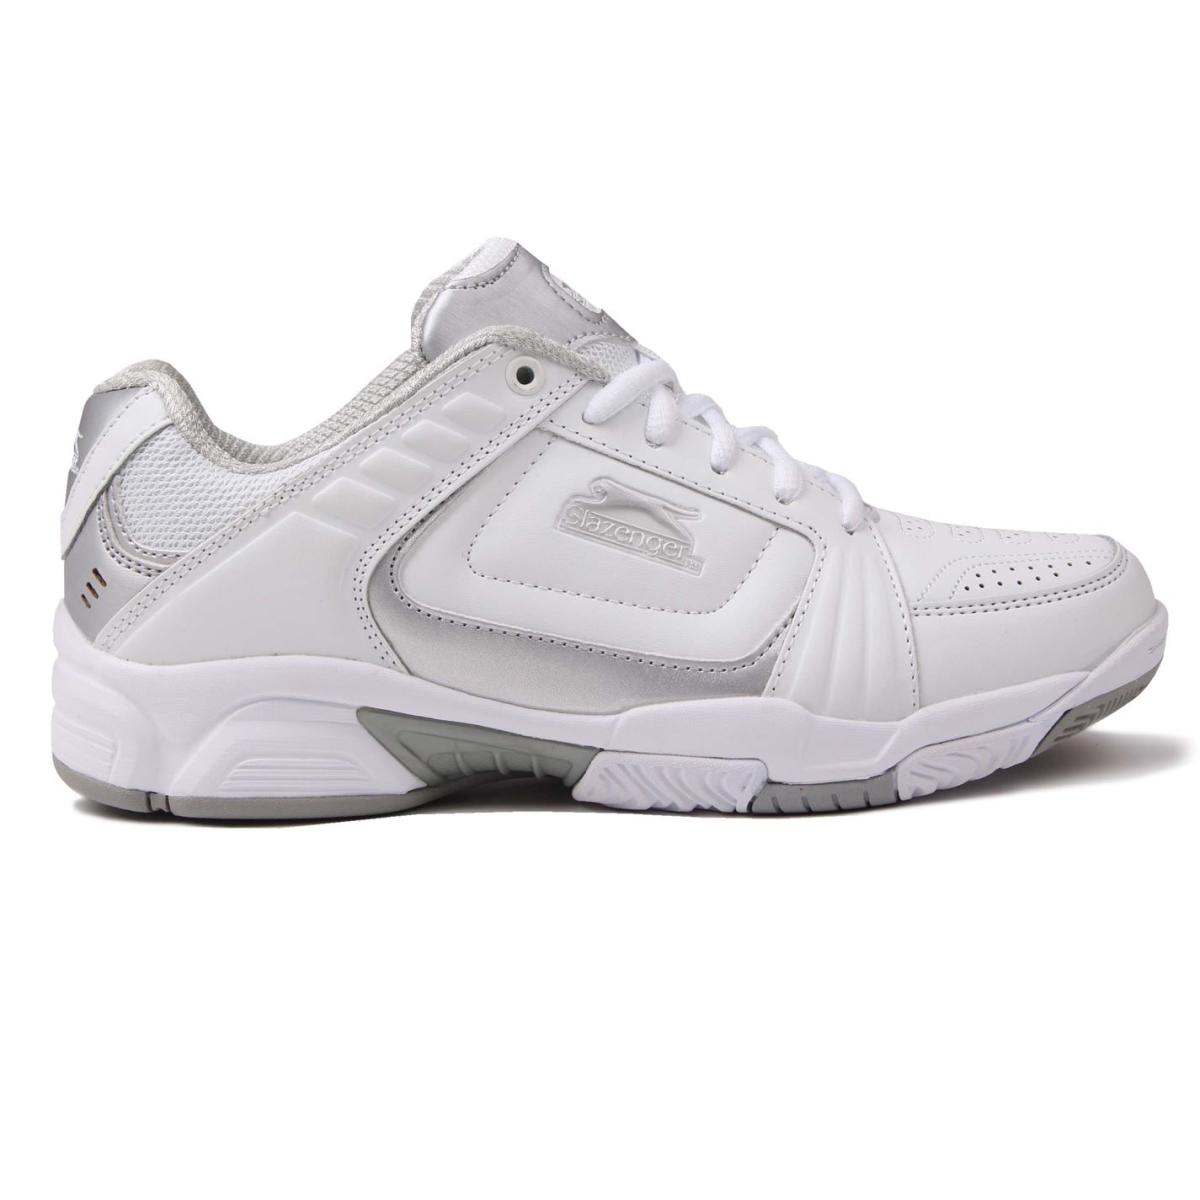 Slazenger-Turnschuhe-Laufschuhe-Damen-Sportschuhe-Sneakers-Lifestyle-6118 Indexbild 2